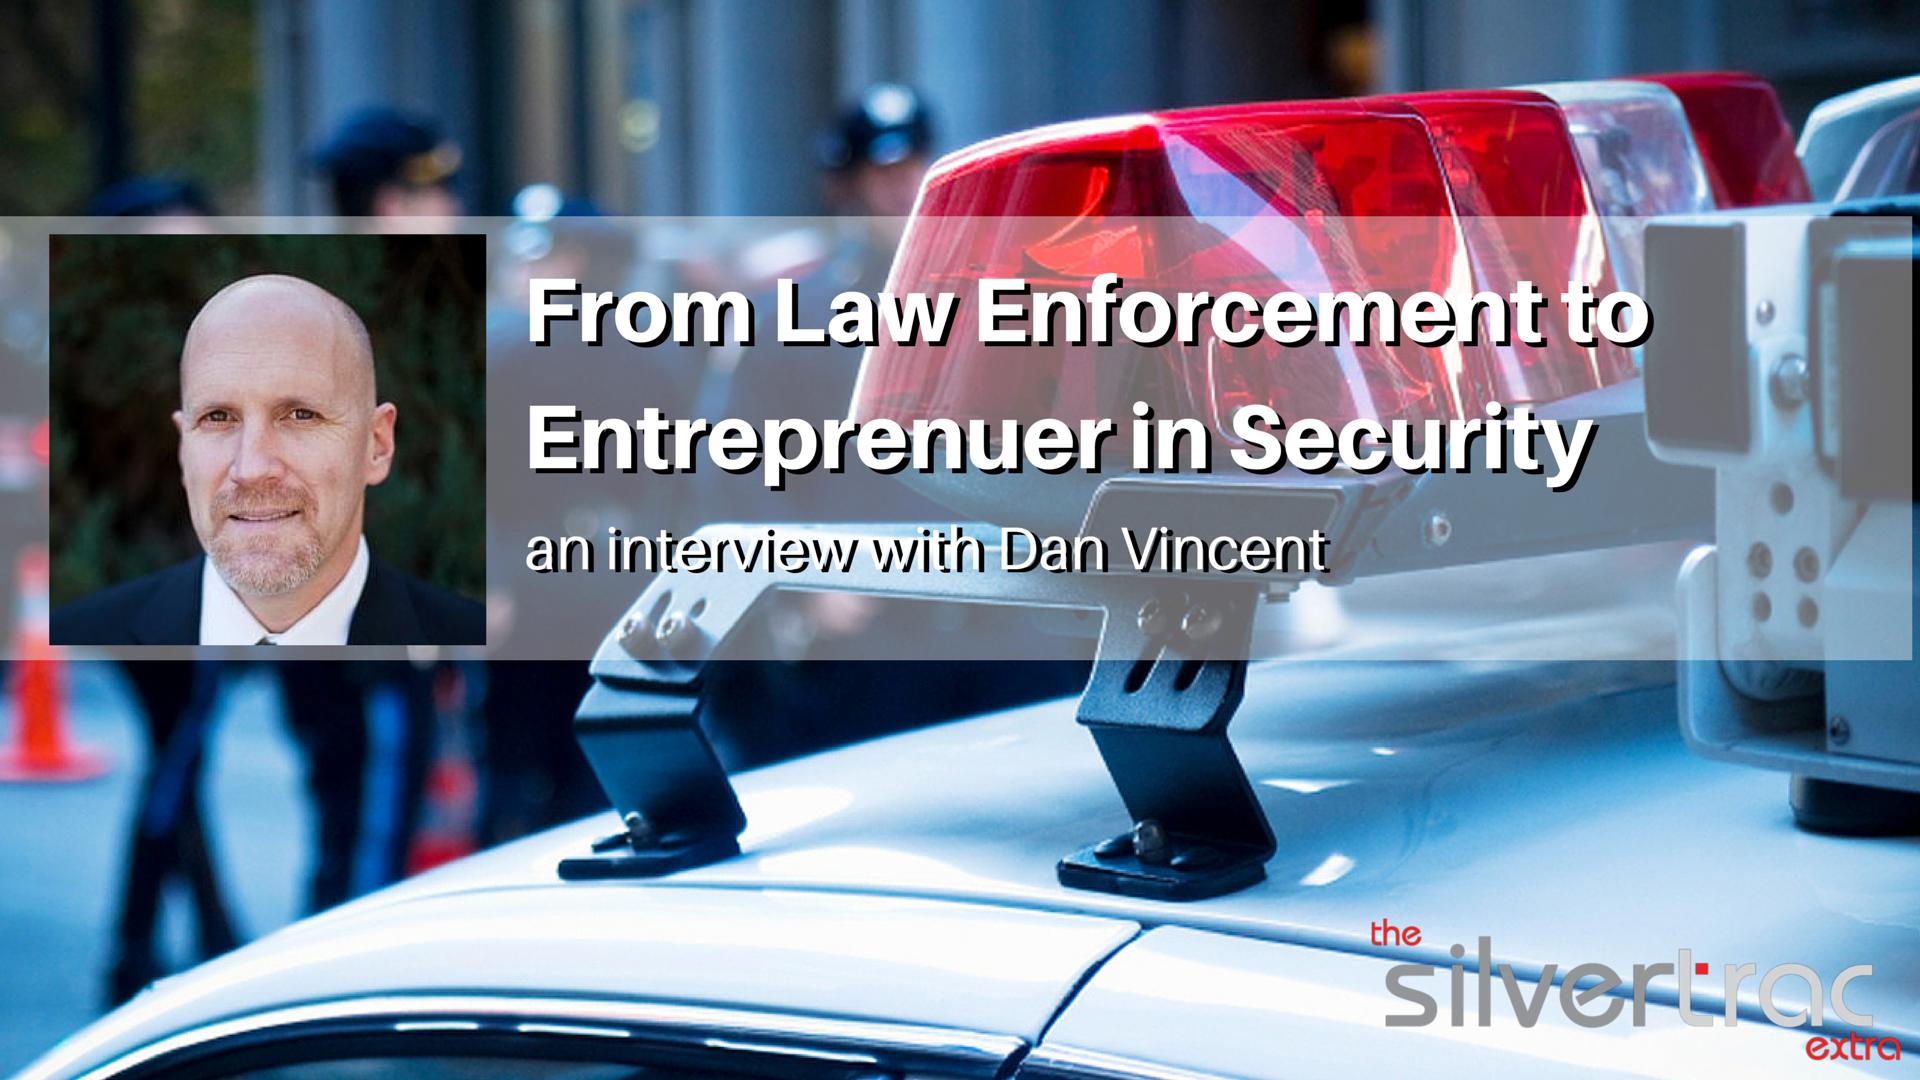 Law Enforcement to Security Entreprenuer